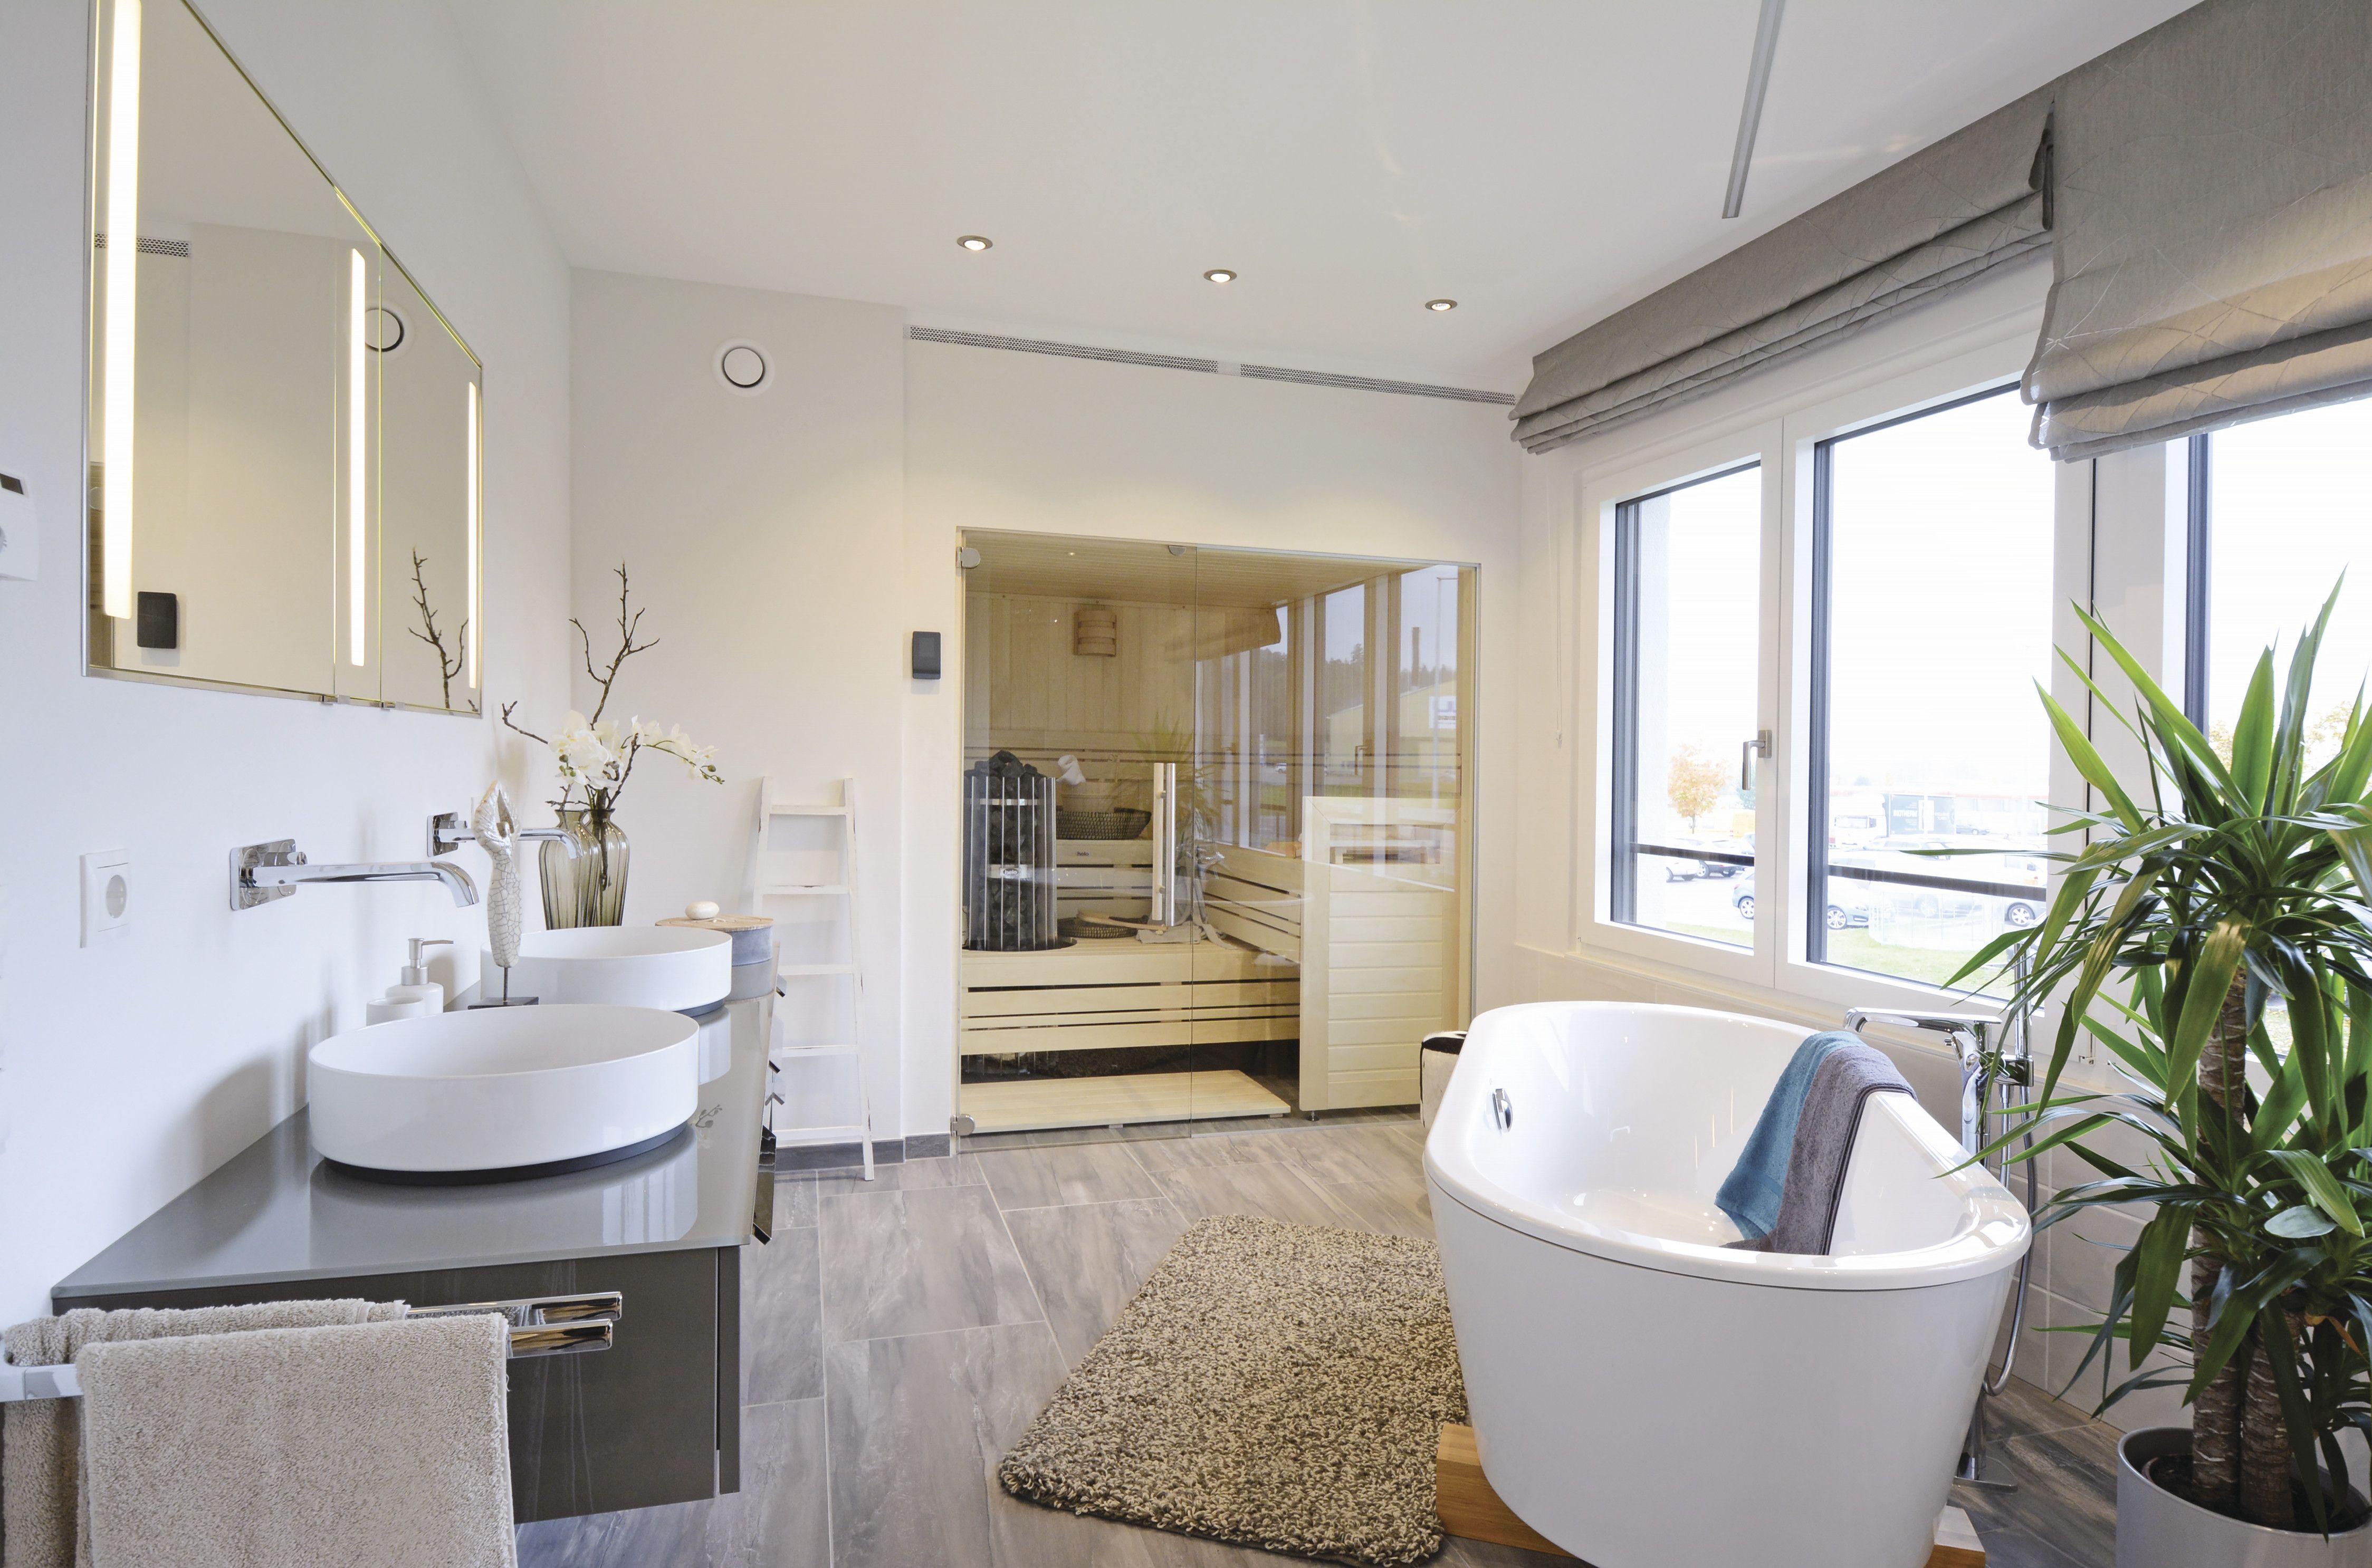 Badezimmer #bad #bathroom #fertighaus #traumhaus #weberhaus #prefab ...